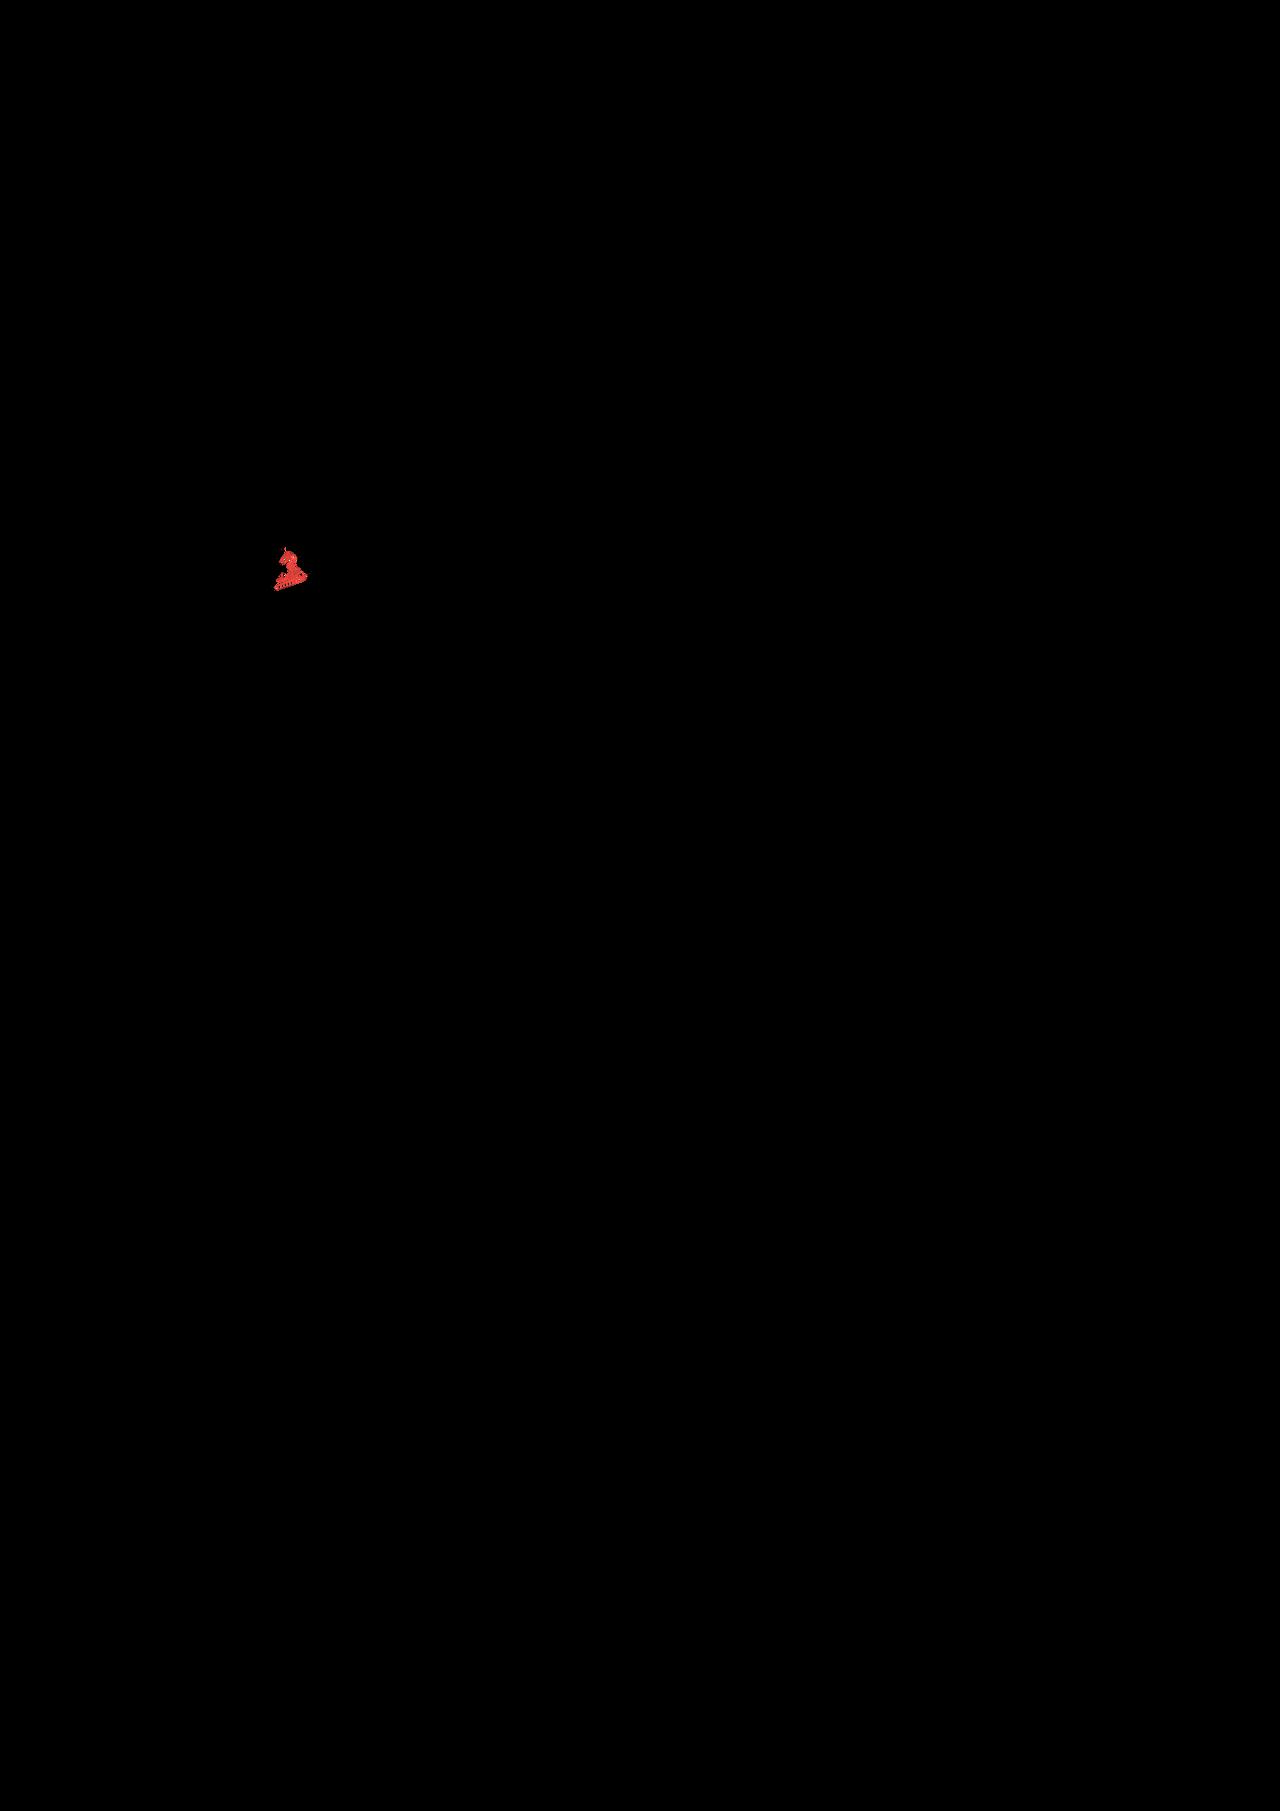 Natsu Lineart : Little natsu lineart by tobeyd on deviantart